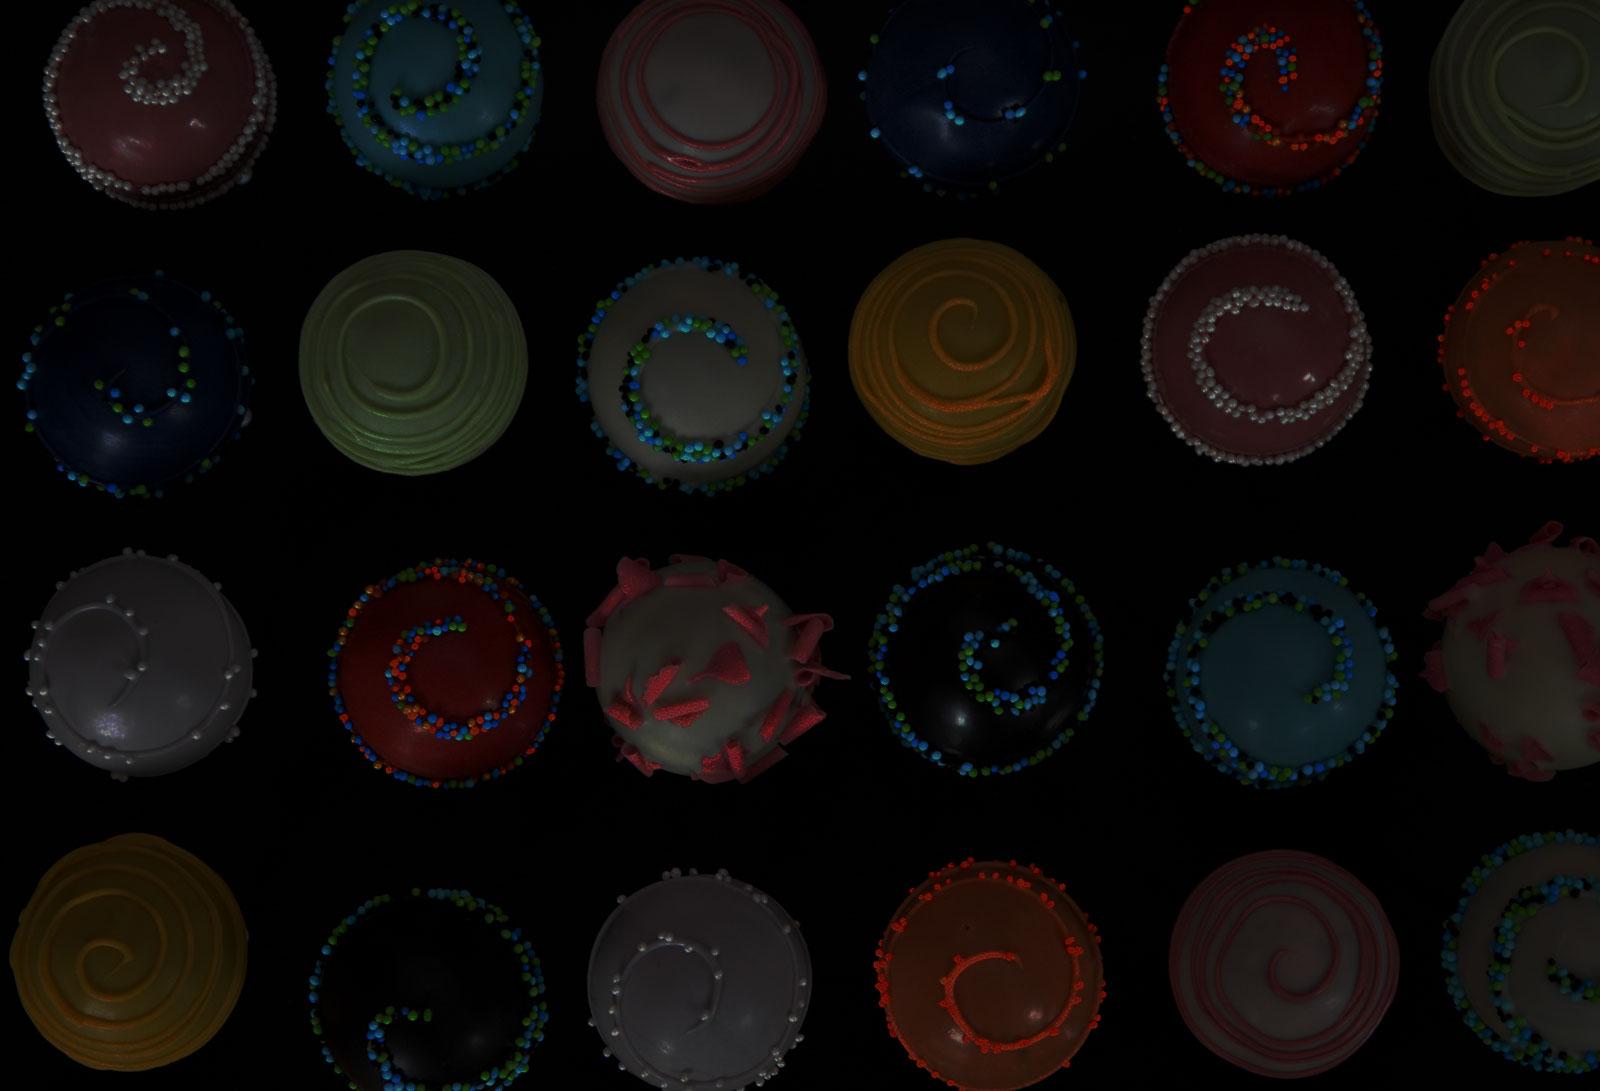 Galéria – Cake pops (sütinyalókák)